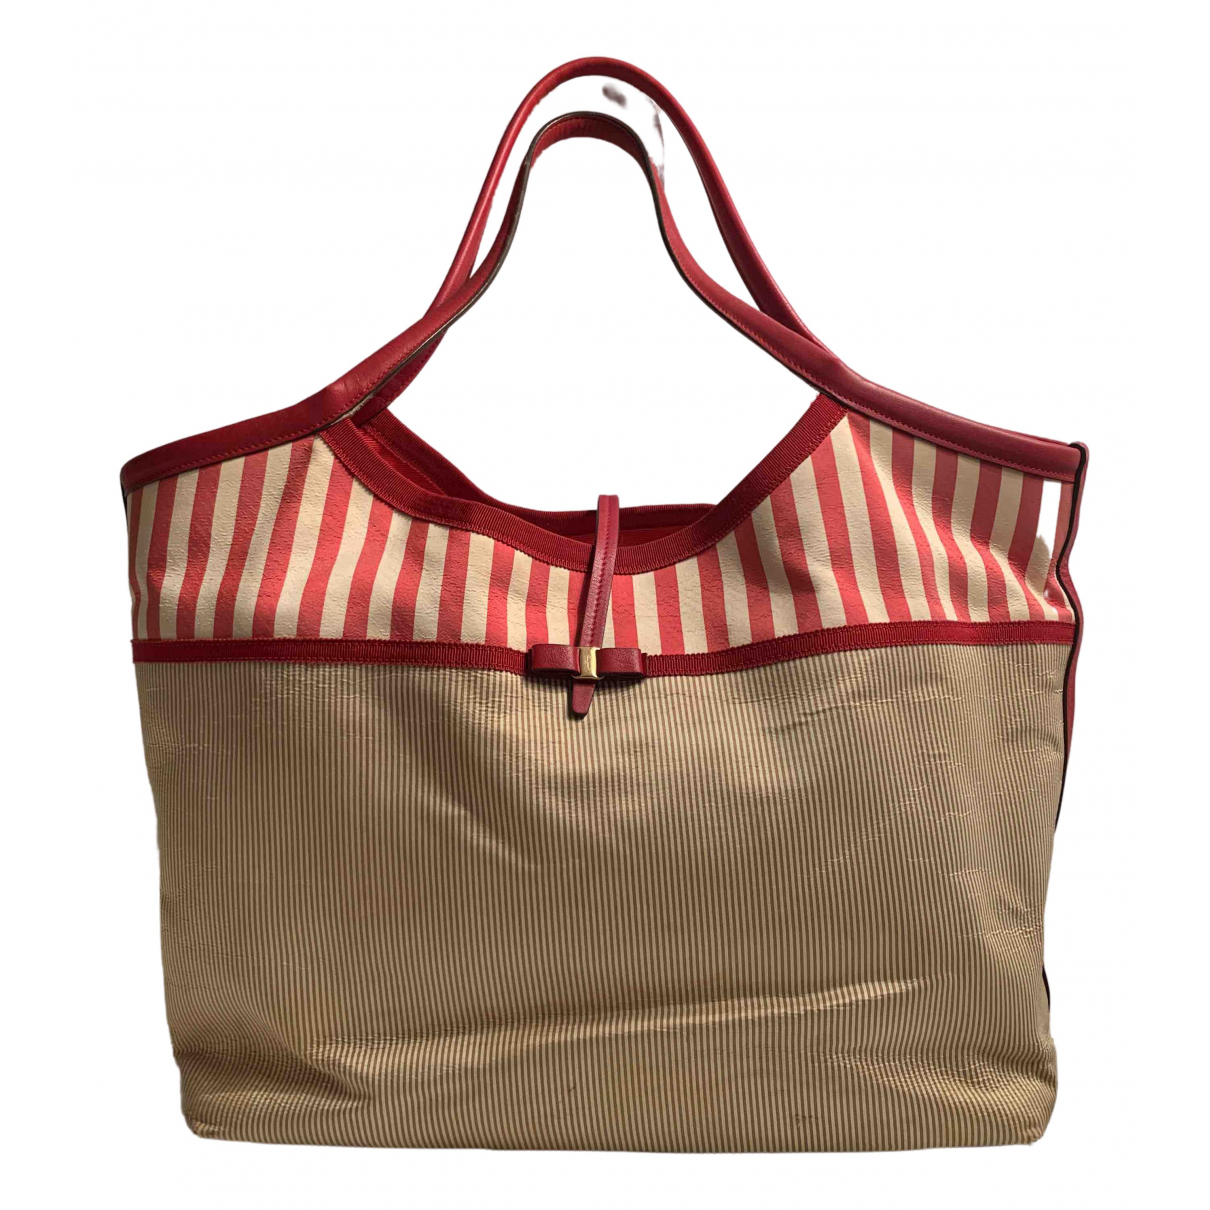 Salvatore Ferragamo N Multicolour Cloth handbag for Women N